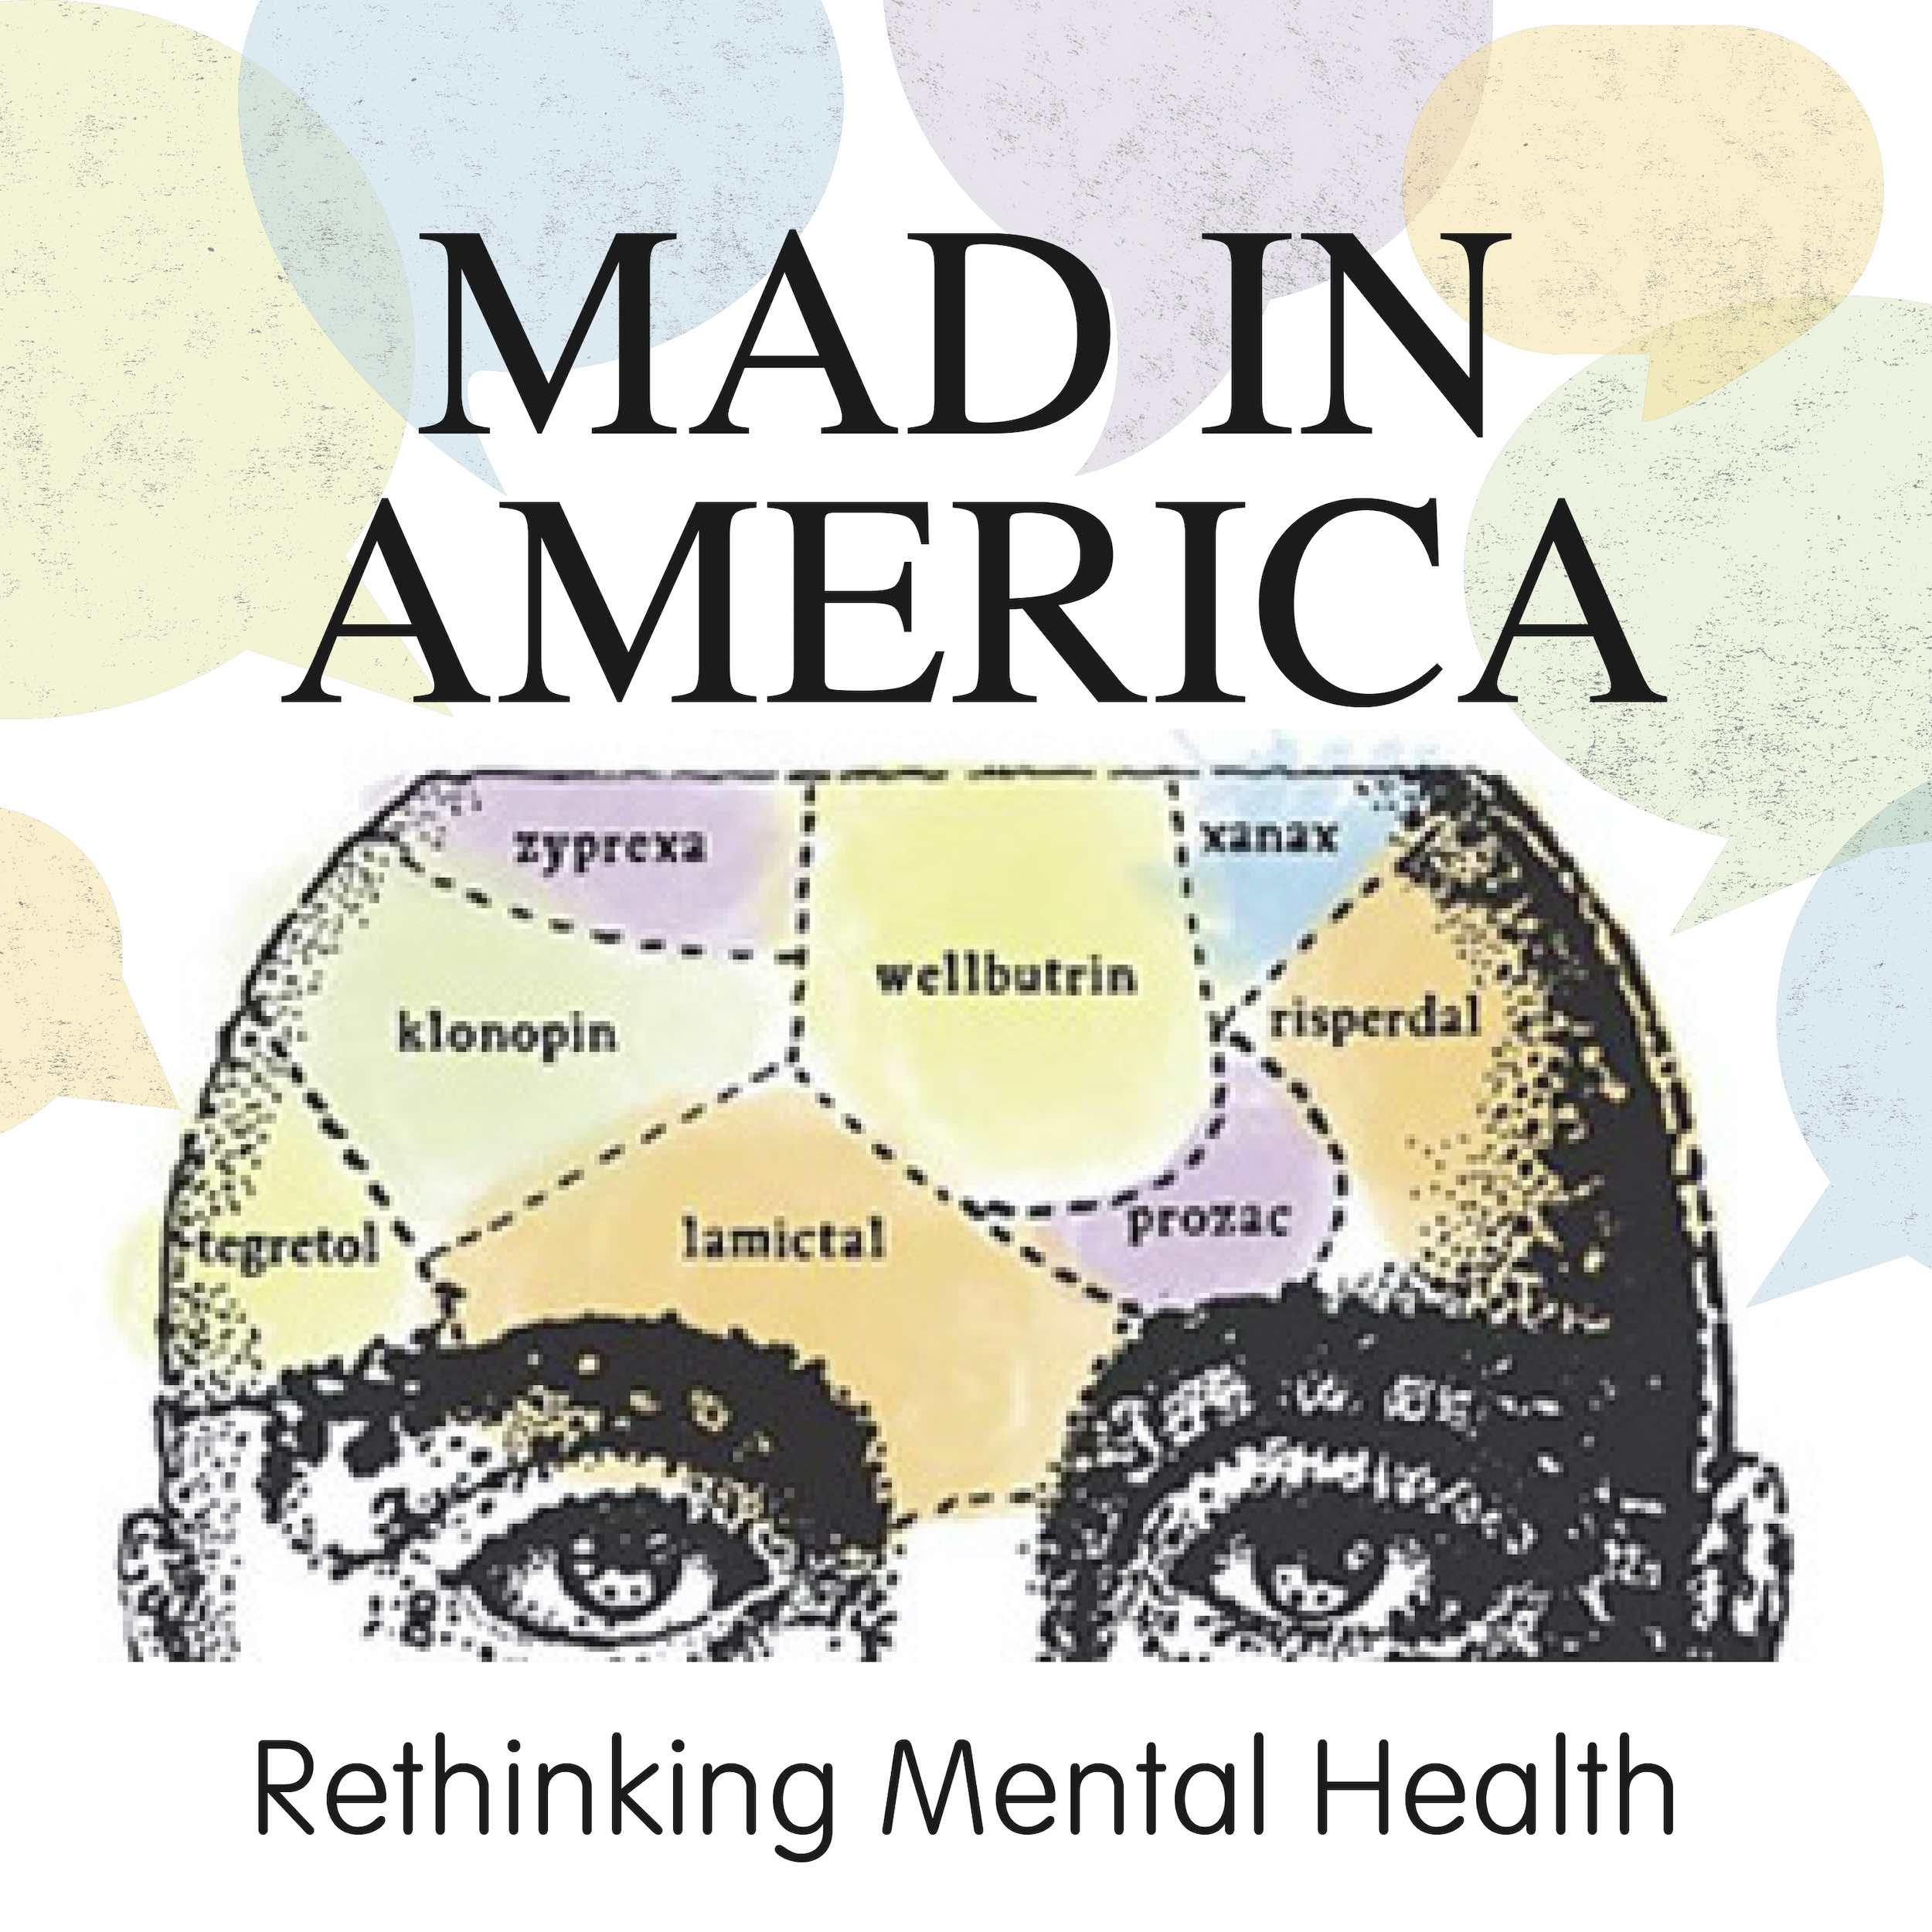 Mad in America: Rethinking Mental Health - Dainius Pūras - Bringing Human Rights to Mental Health Care